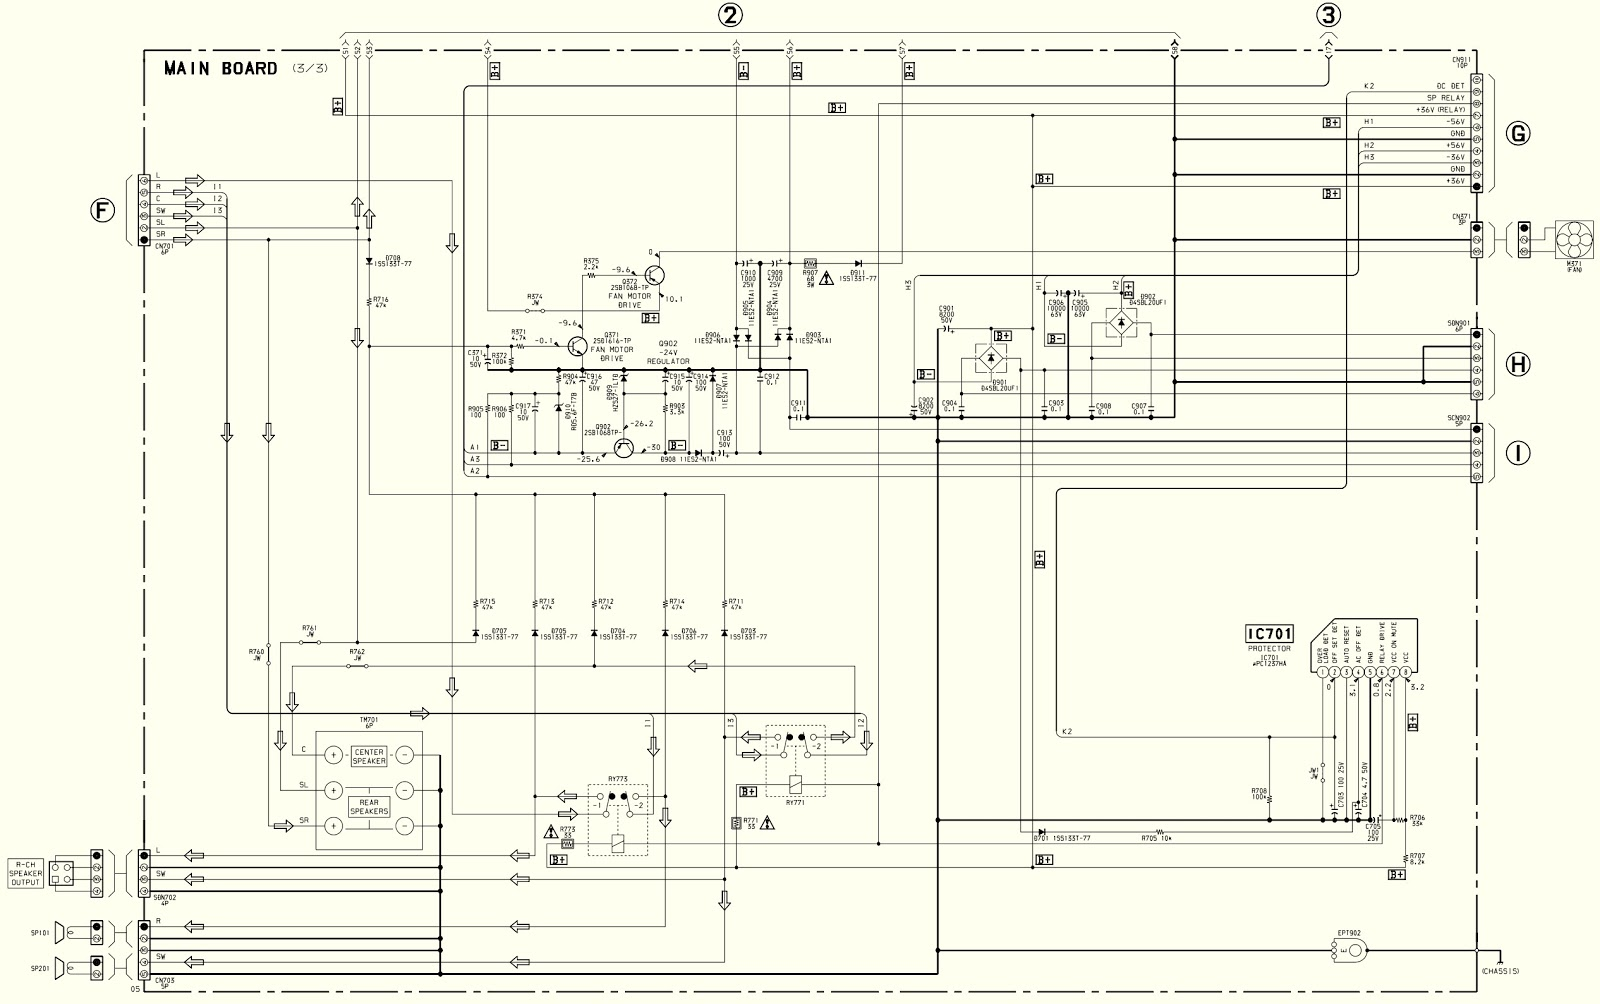 hight resolution of  sony sava 500 test mode schematic diagram home theater speaker home speaker wiring diagram